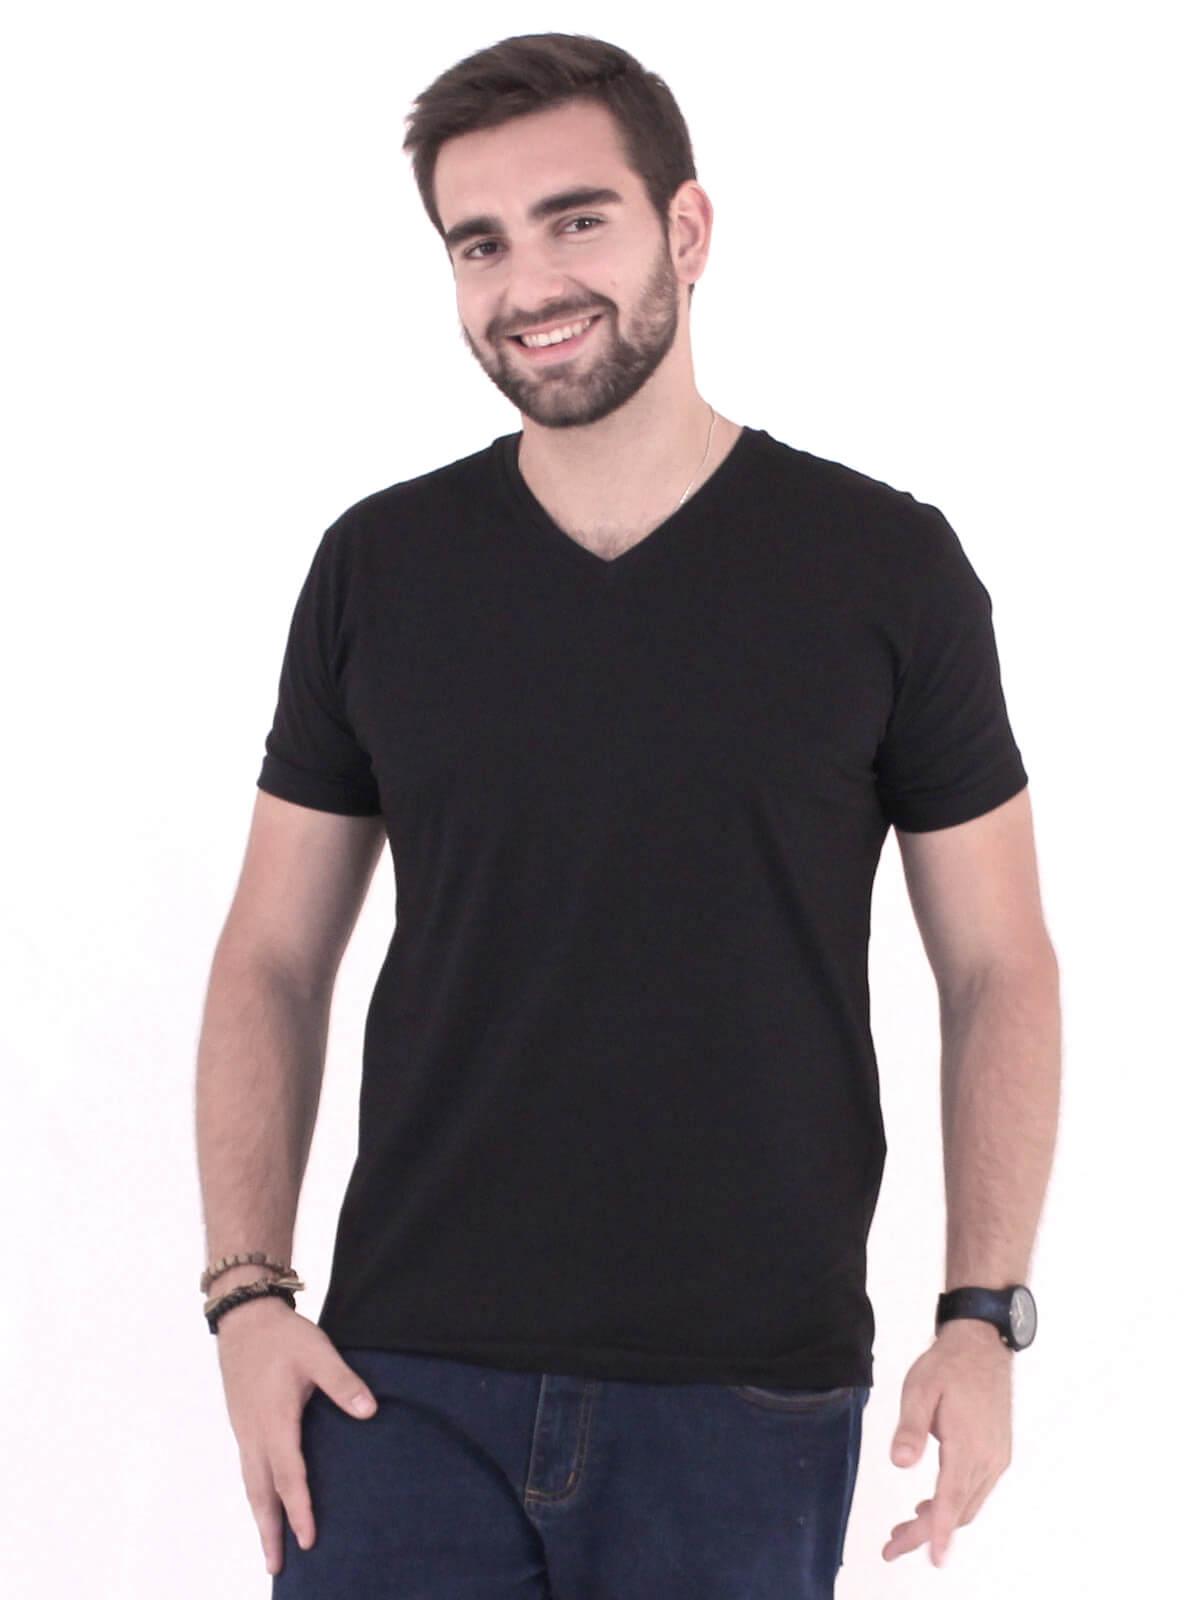 Camiseta Masculina Decote V. Algodão Slim Fit Lisa Preto